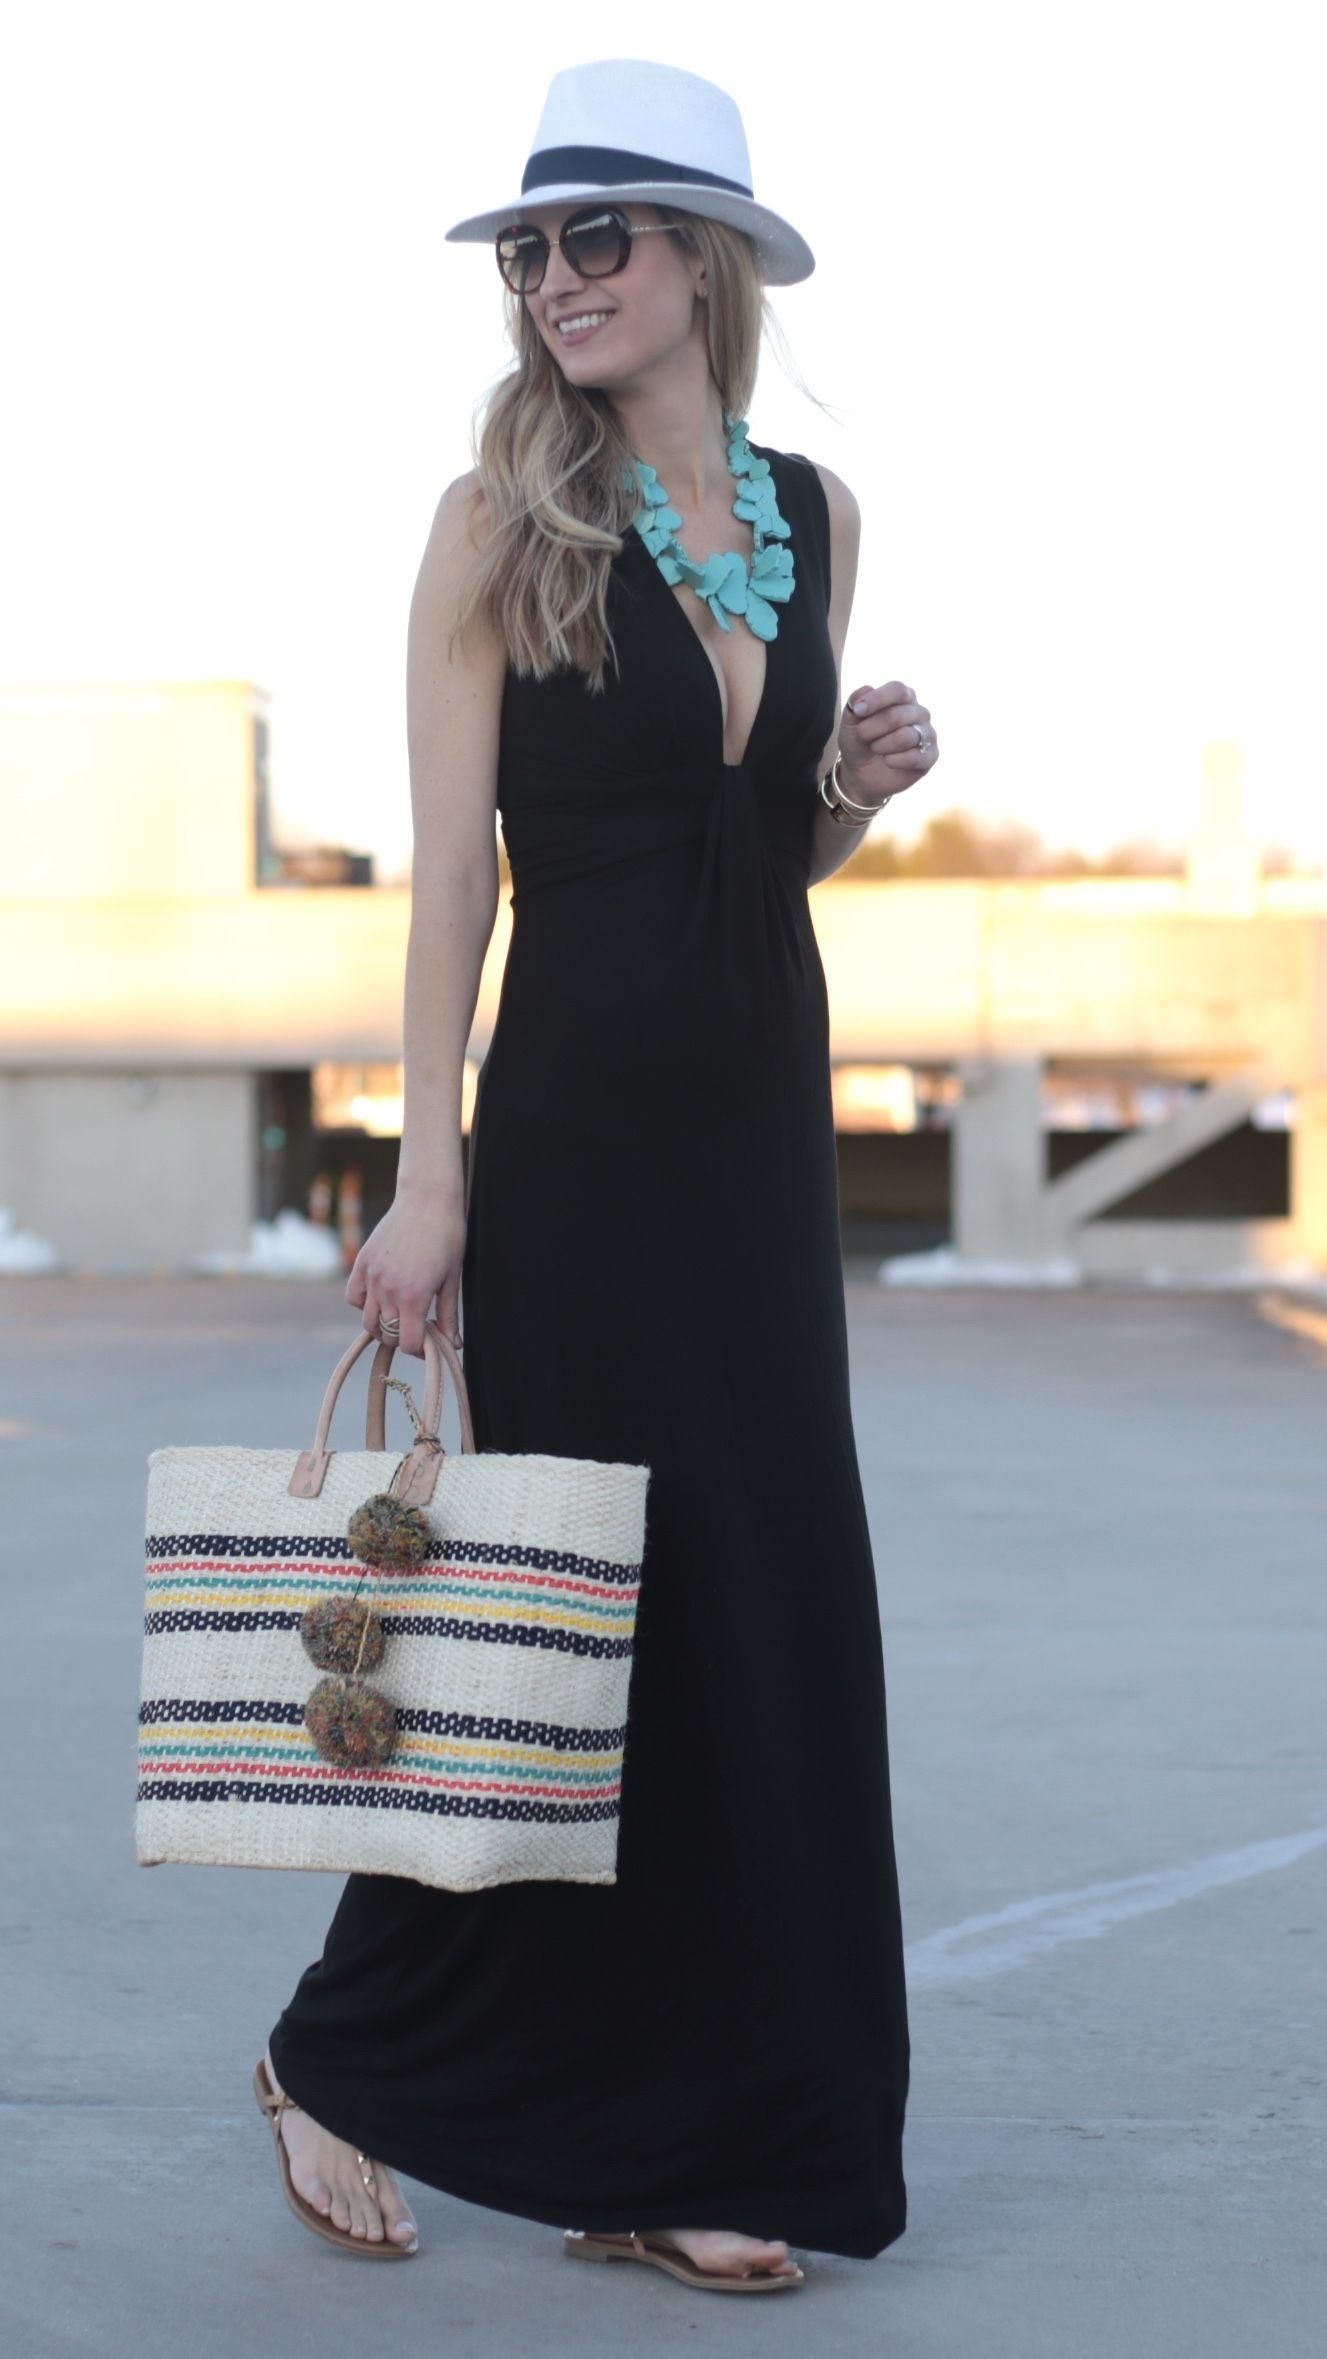 7a55caa502 spring outfit idea: black deep cut maxi dress with Panama hat ...